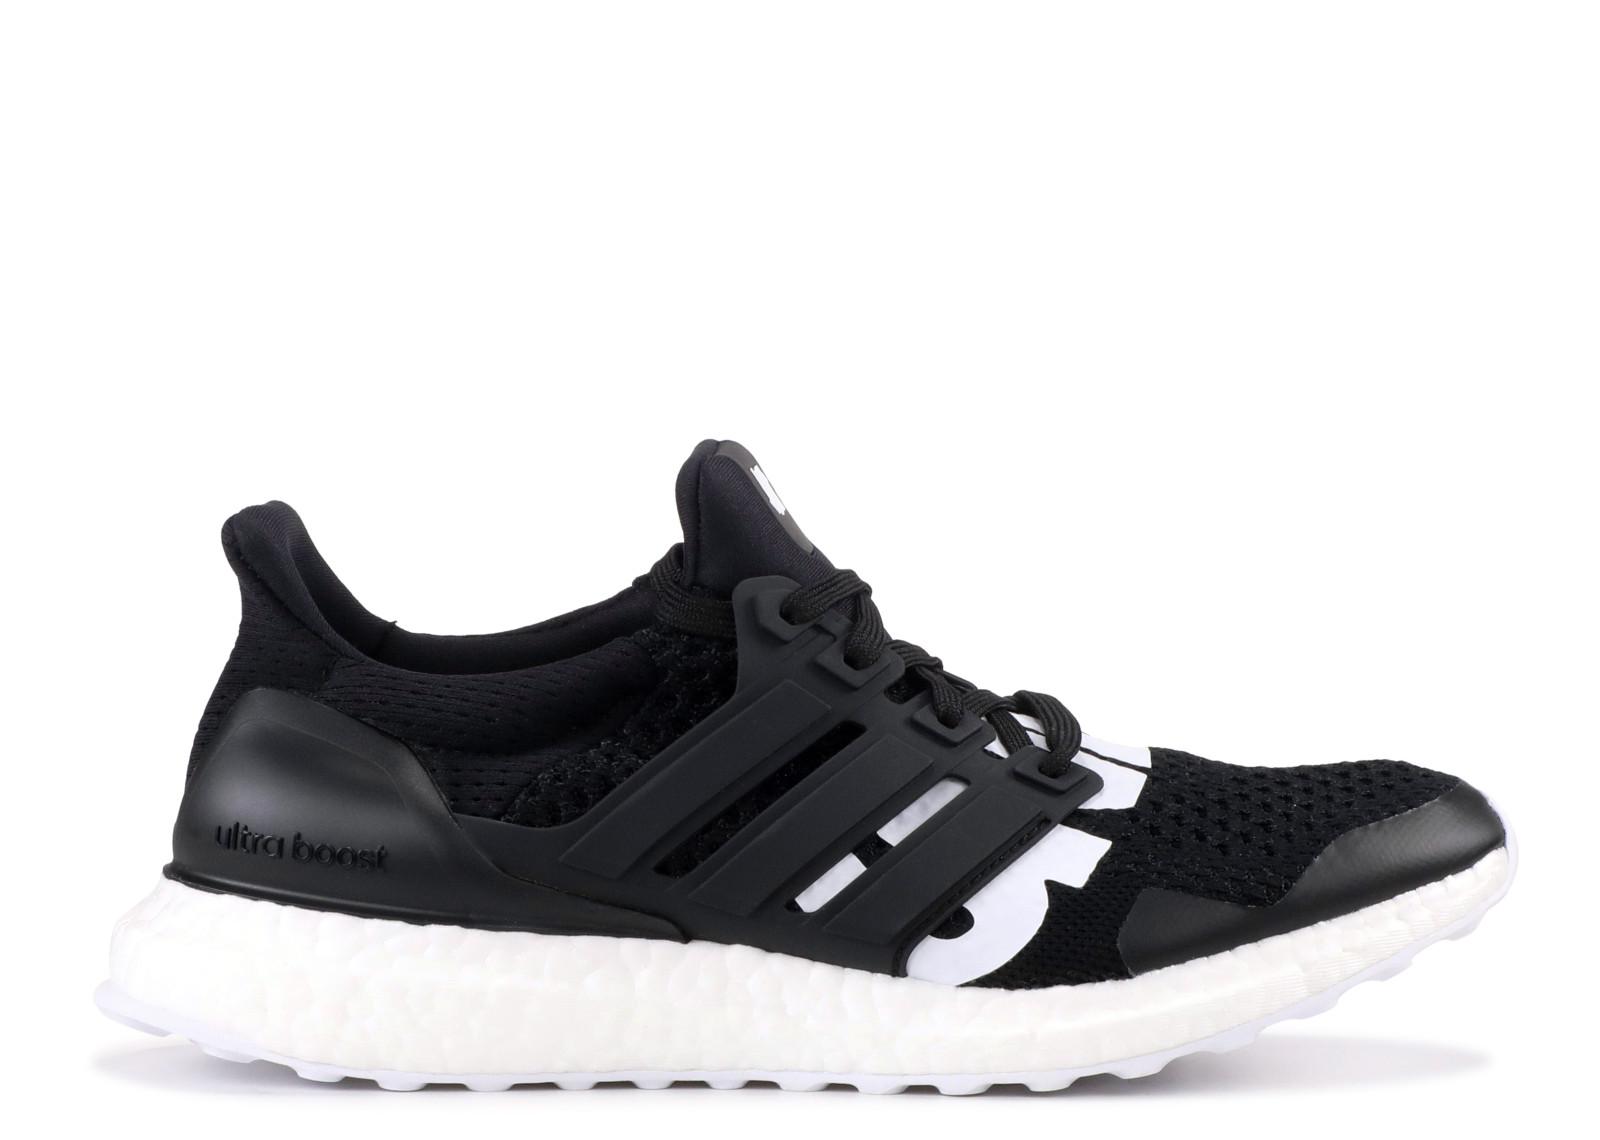 89ec057e458f9 adidas Ultra Boost 1.0 UNDFTD Black - 0